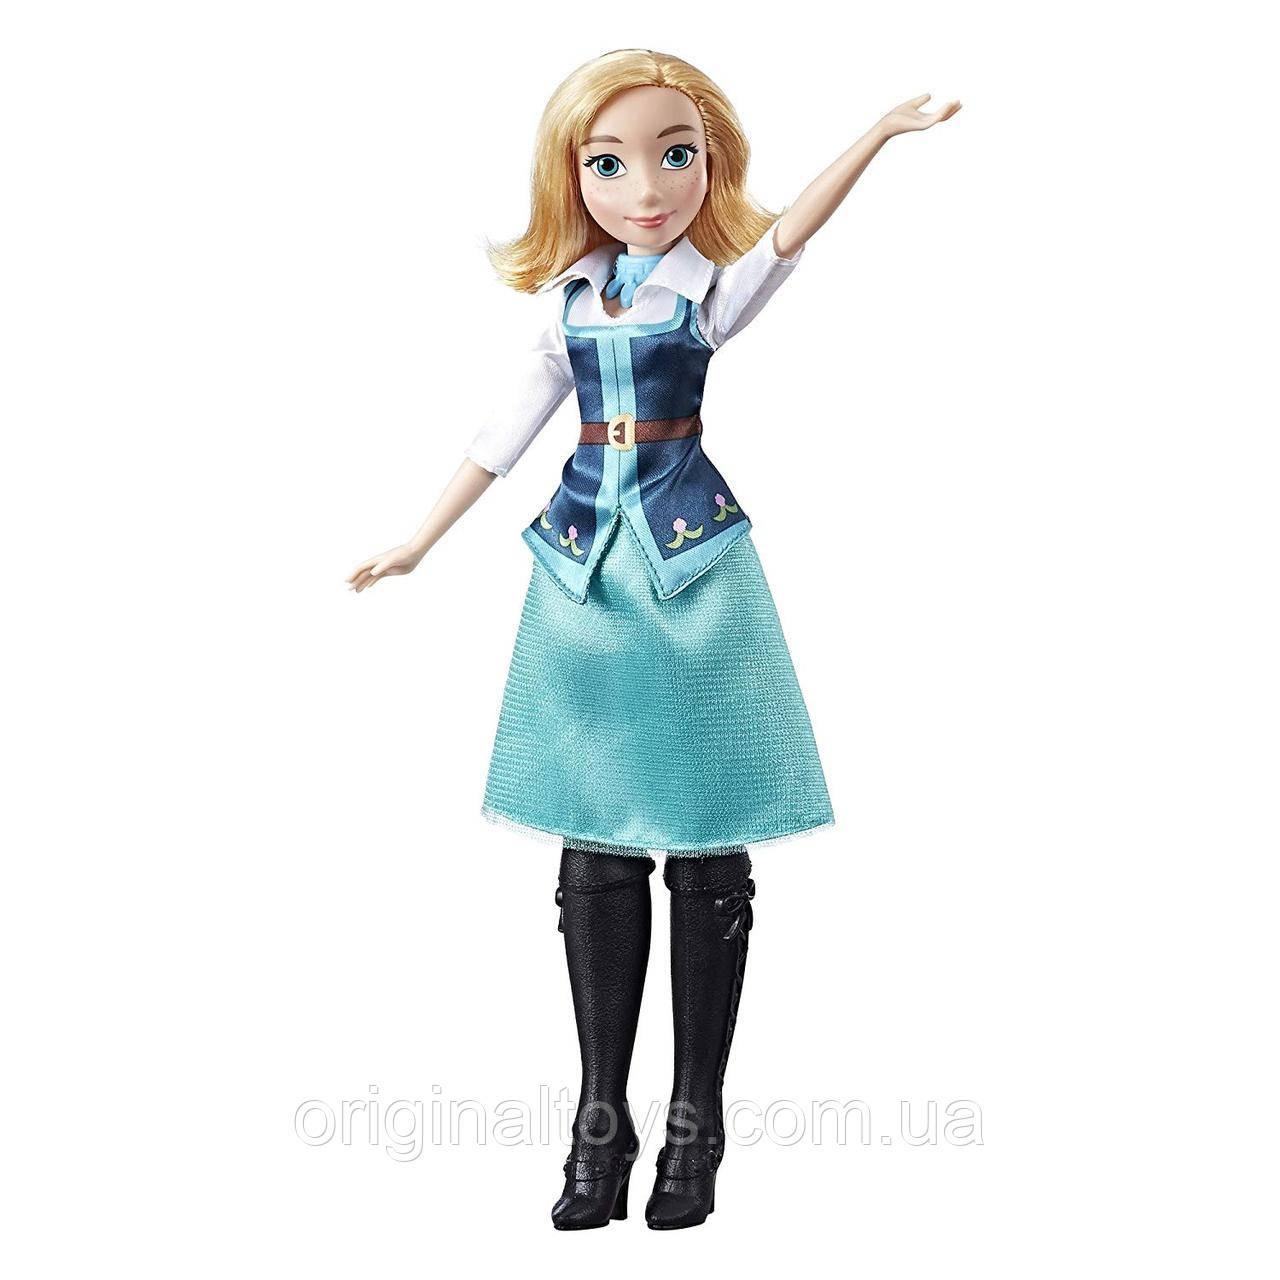 Кукла Наоми Тёрнер - Елена из Авалора - Disney Elena of Avalor Naomi Turner Hasbro